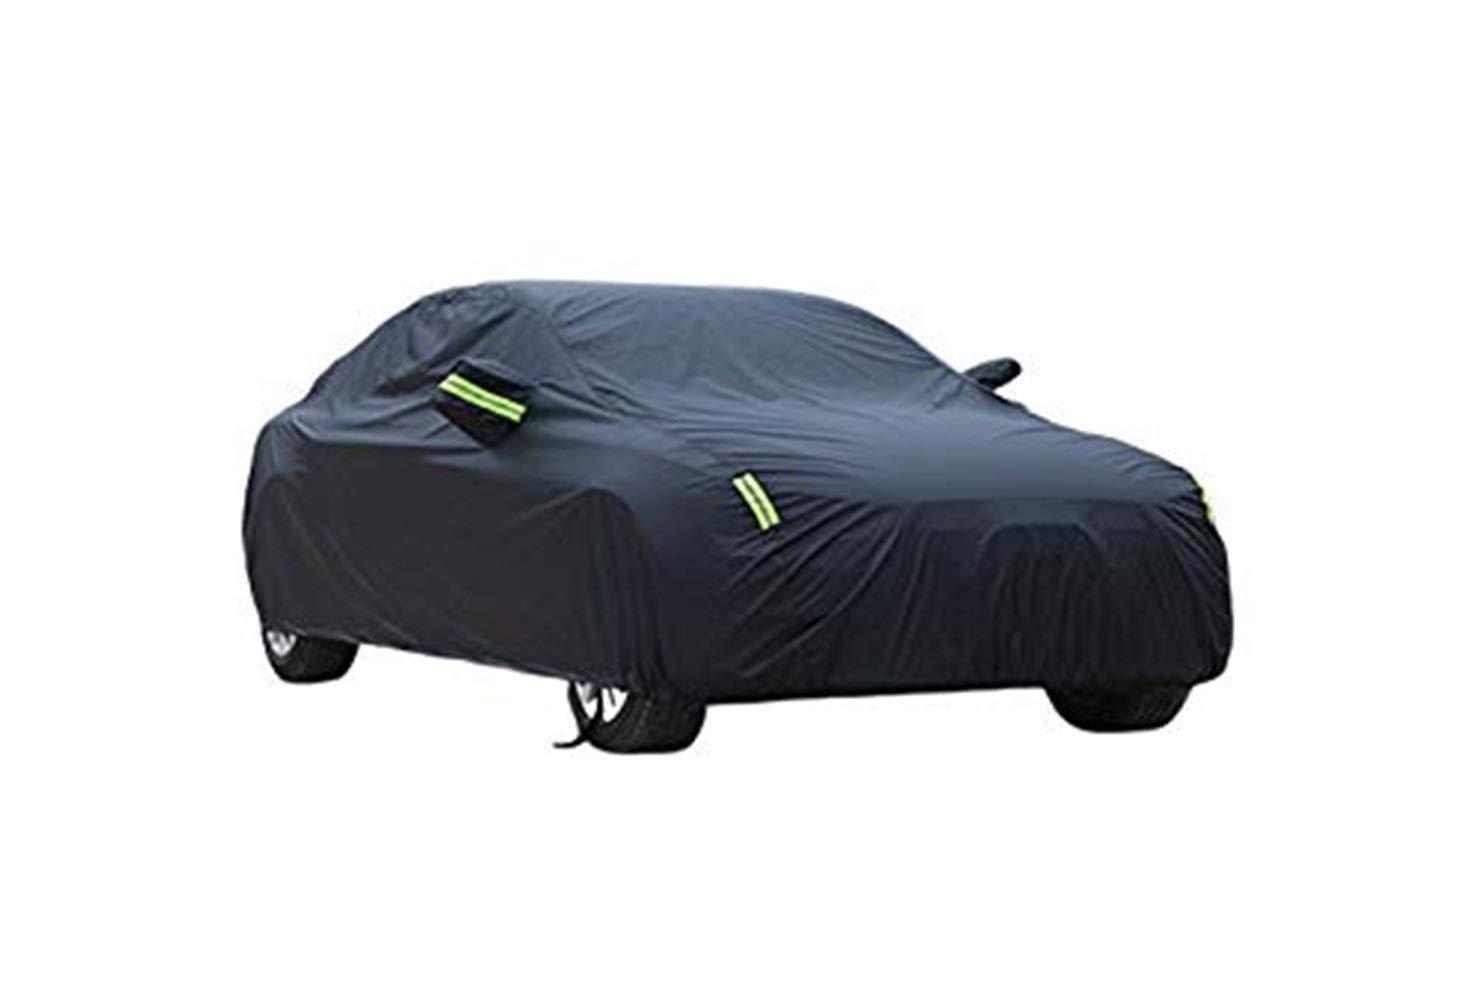 Yxsd Adecuado For LEXUS Car Cover LEXUS NX200 NX300 NX300H NX300F NX300H F RX300 RX300F RX450H Protecci/ón Solar A Prueba De Lluvia Espesar Aislamiento LEXUS Cubierta Especial For Auto